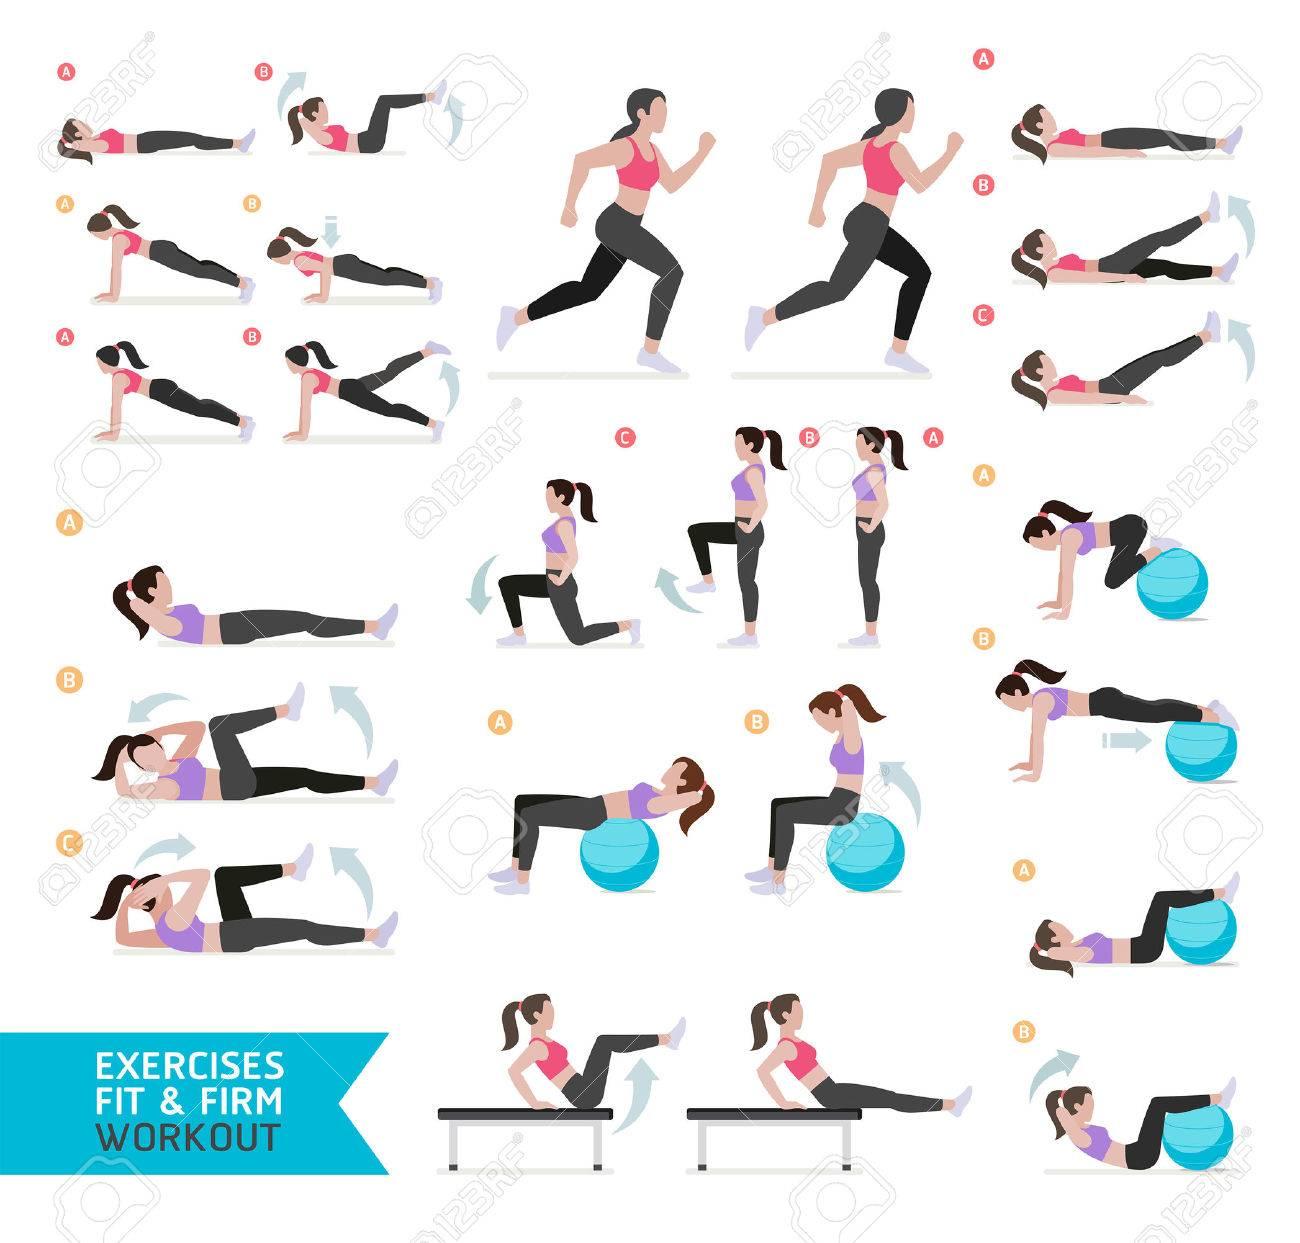 entrainement gym femme